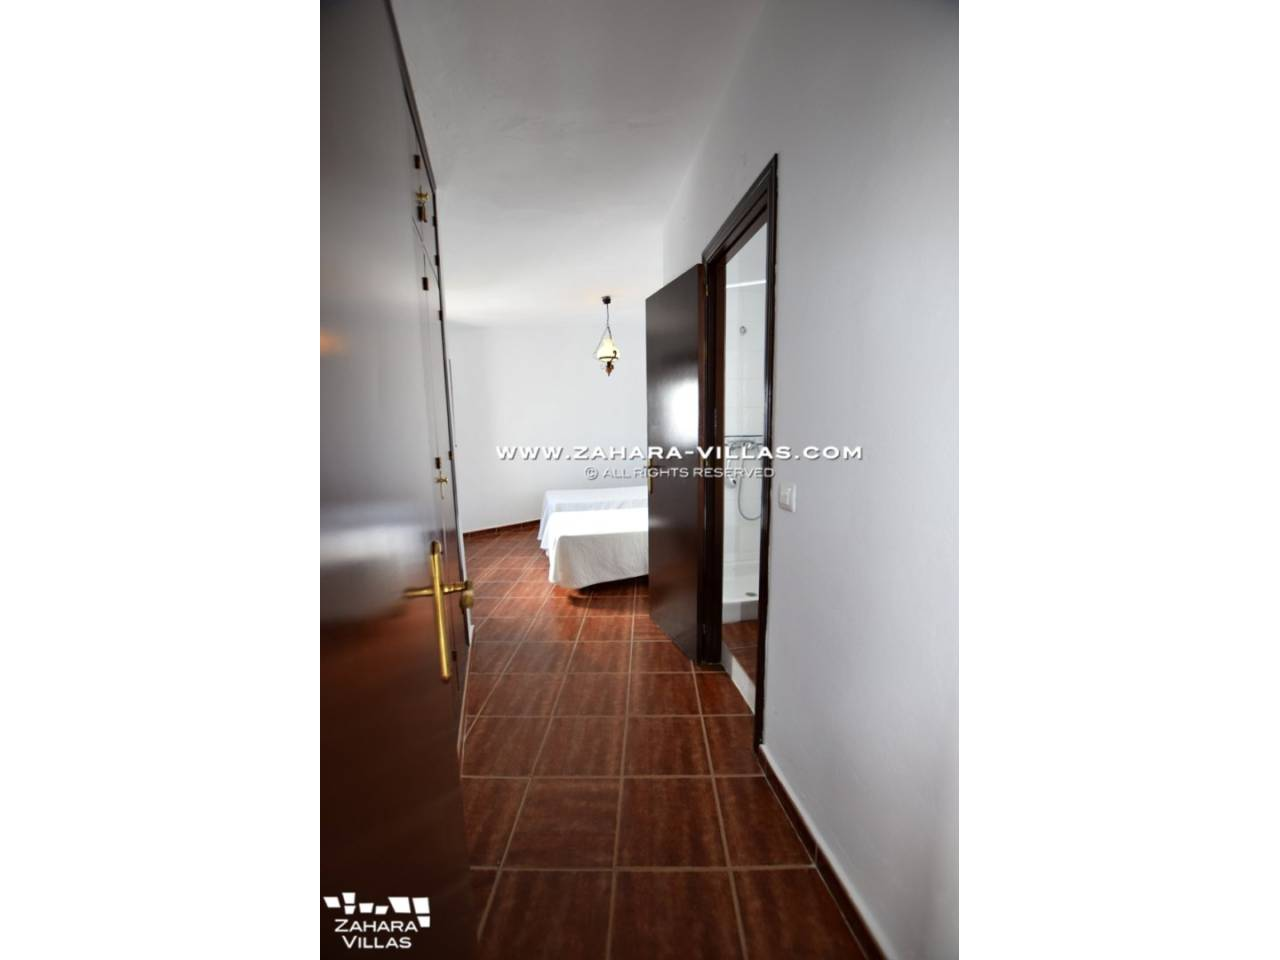 Imagen 5 de House, Apartment and Plot to build in the historic center of Vejer de la Frontera